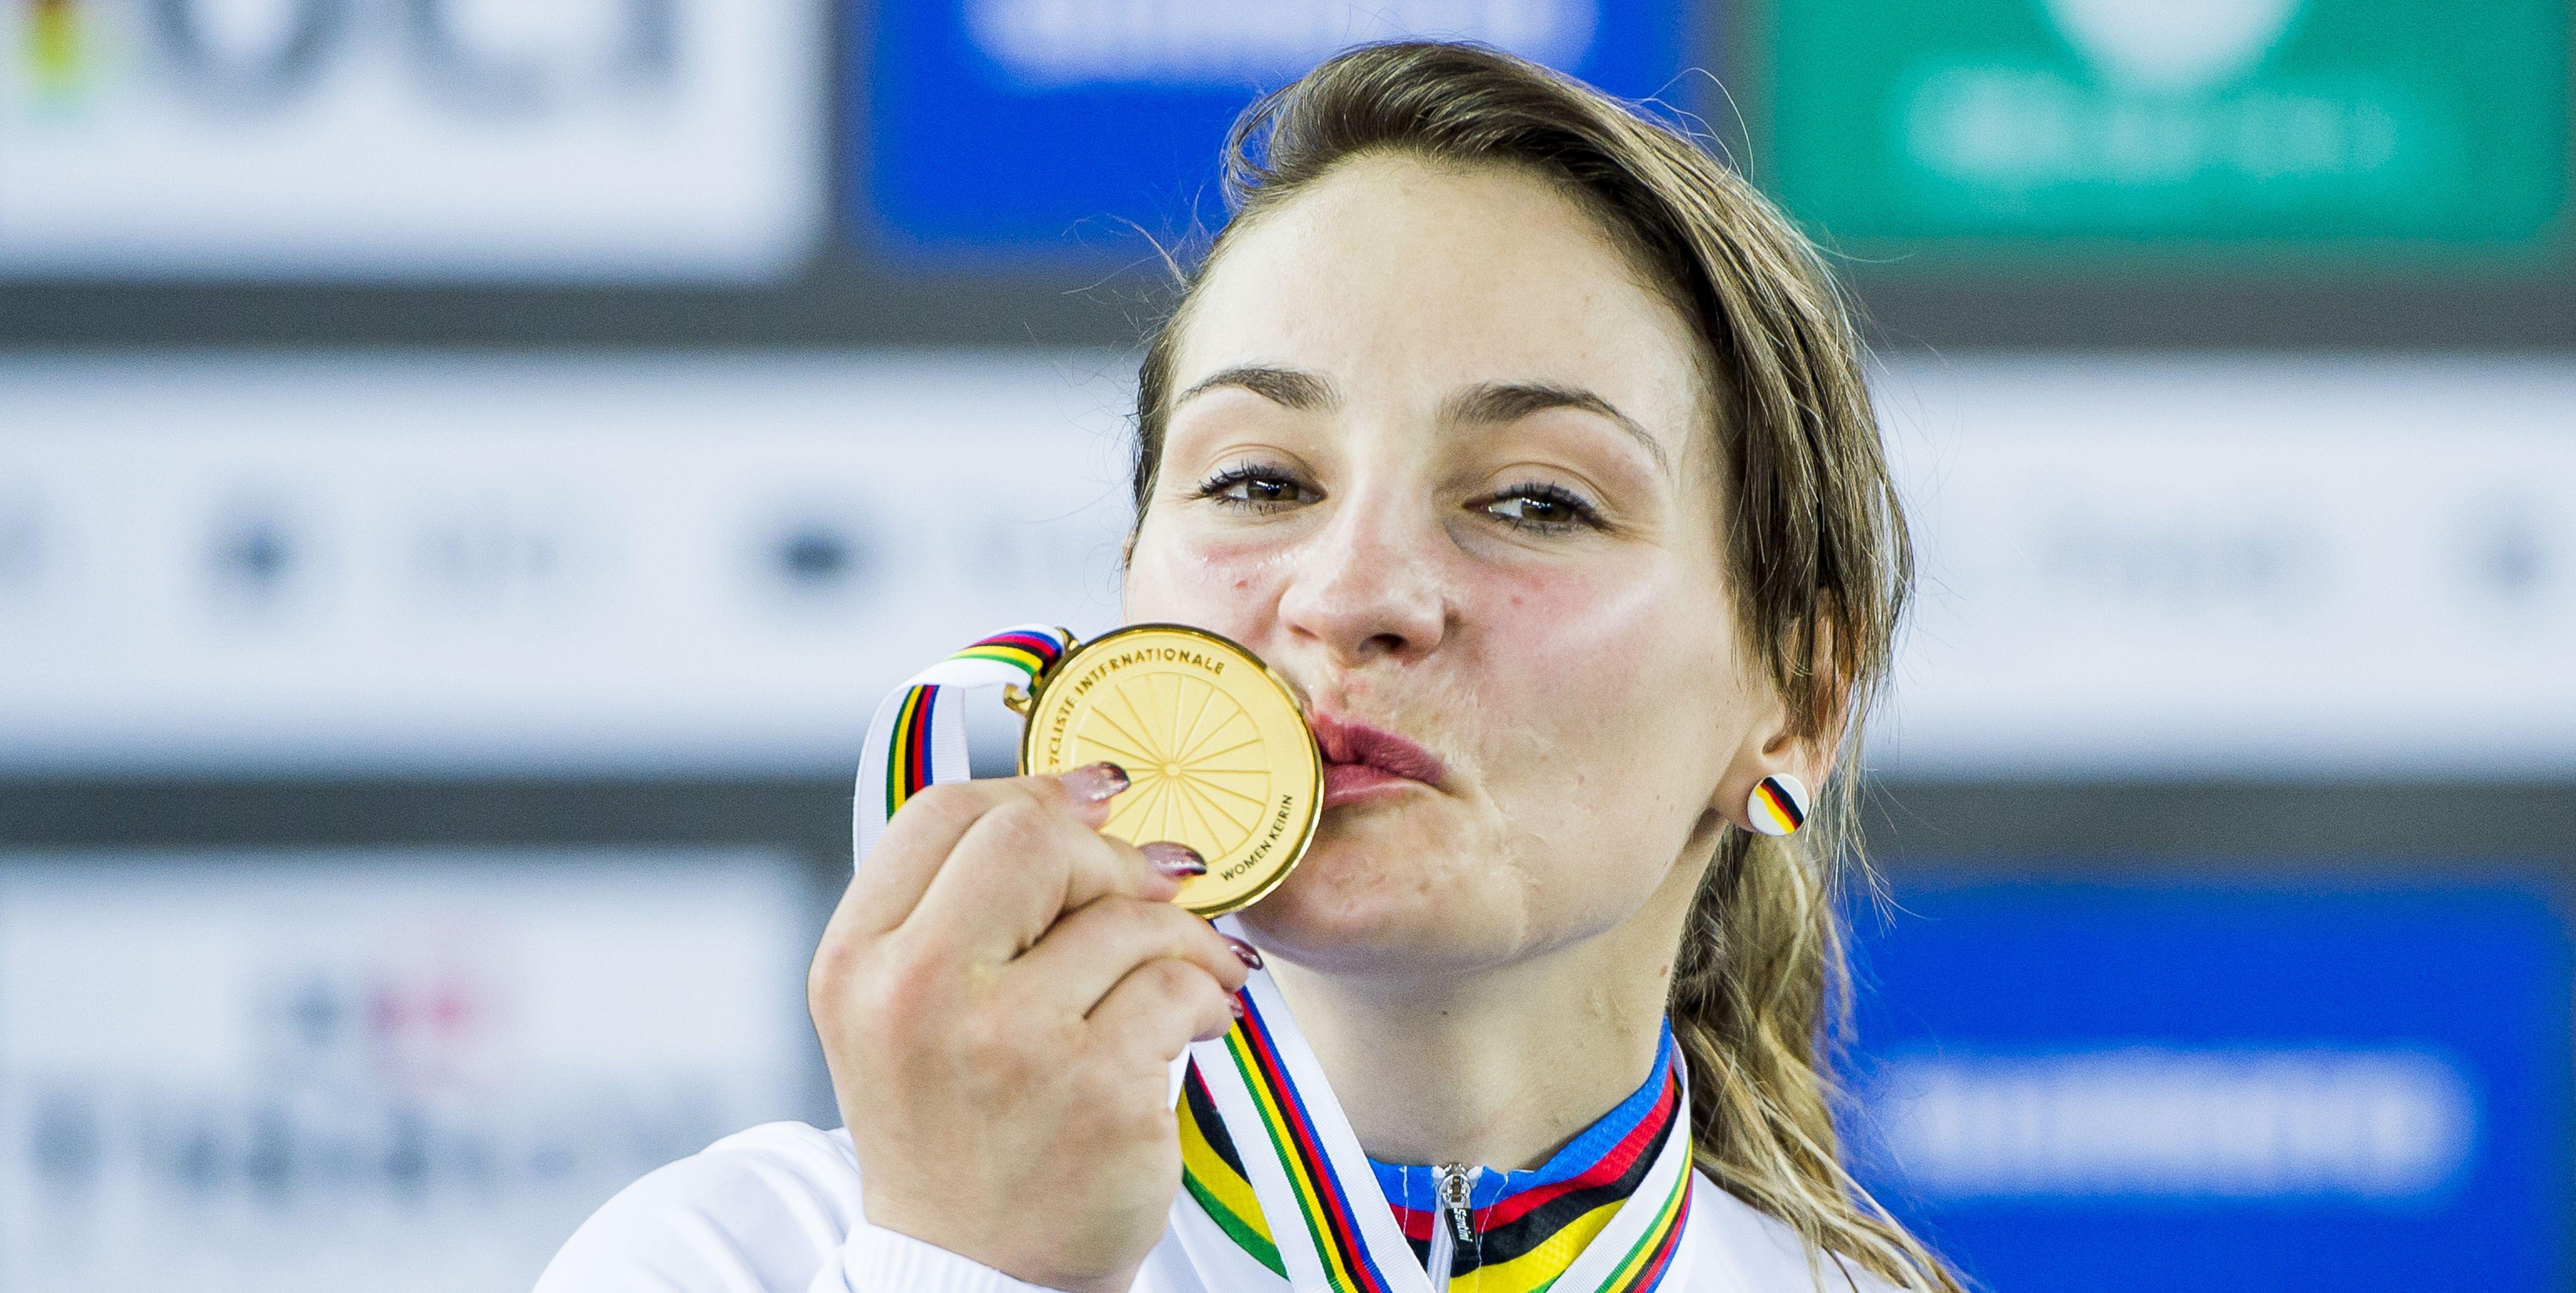 Kristina Vogel Paralyzed In Bike Crash Olympic Cycling